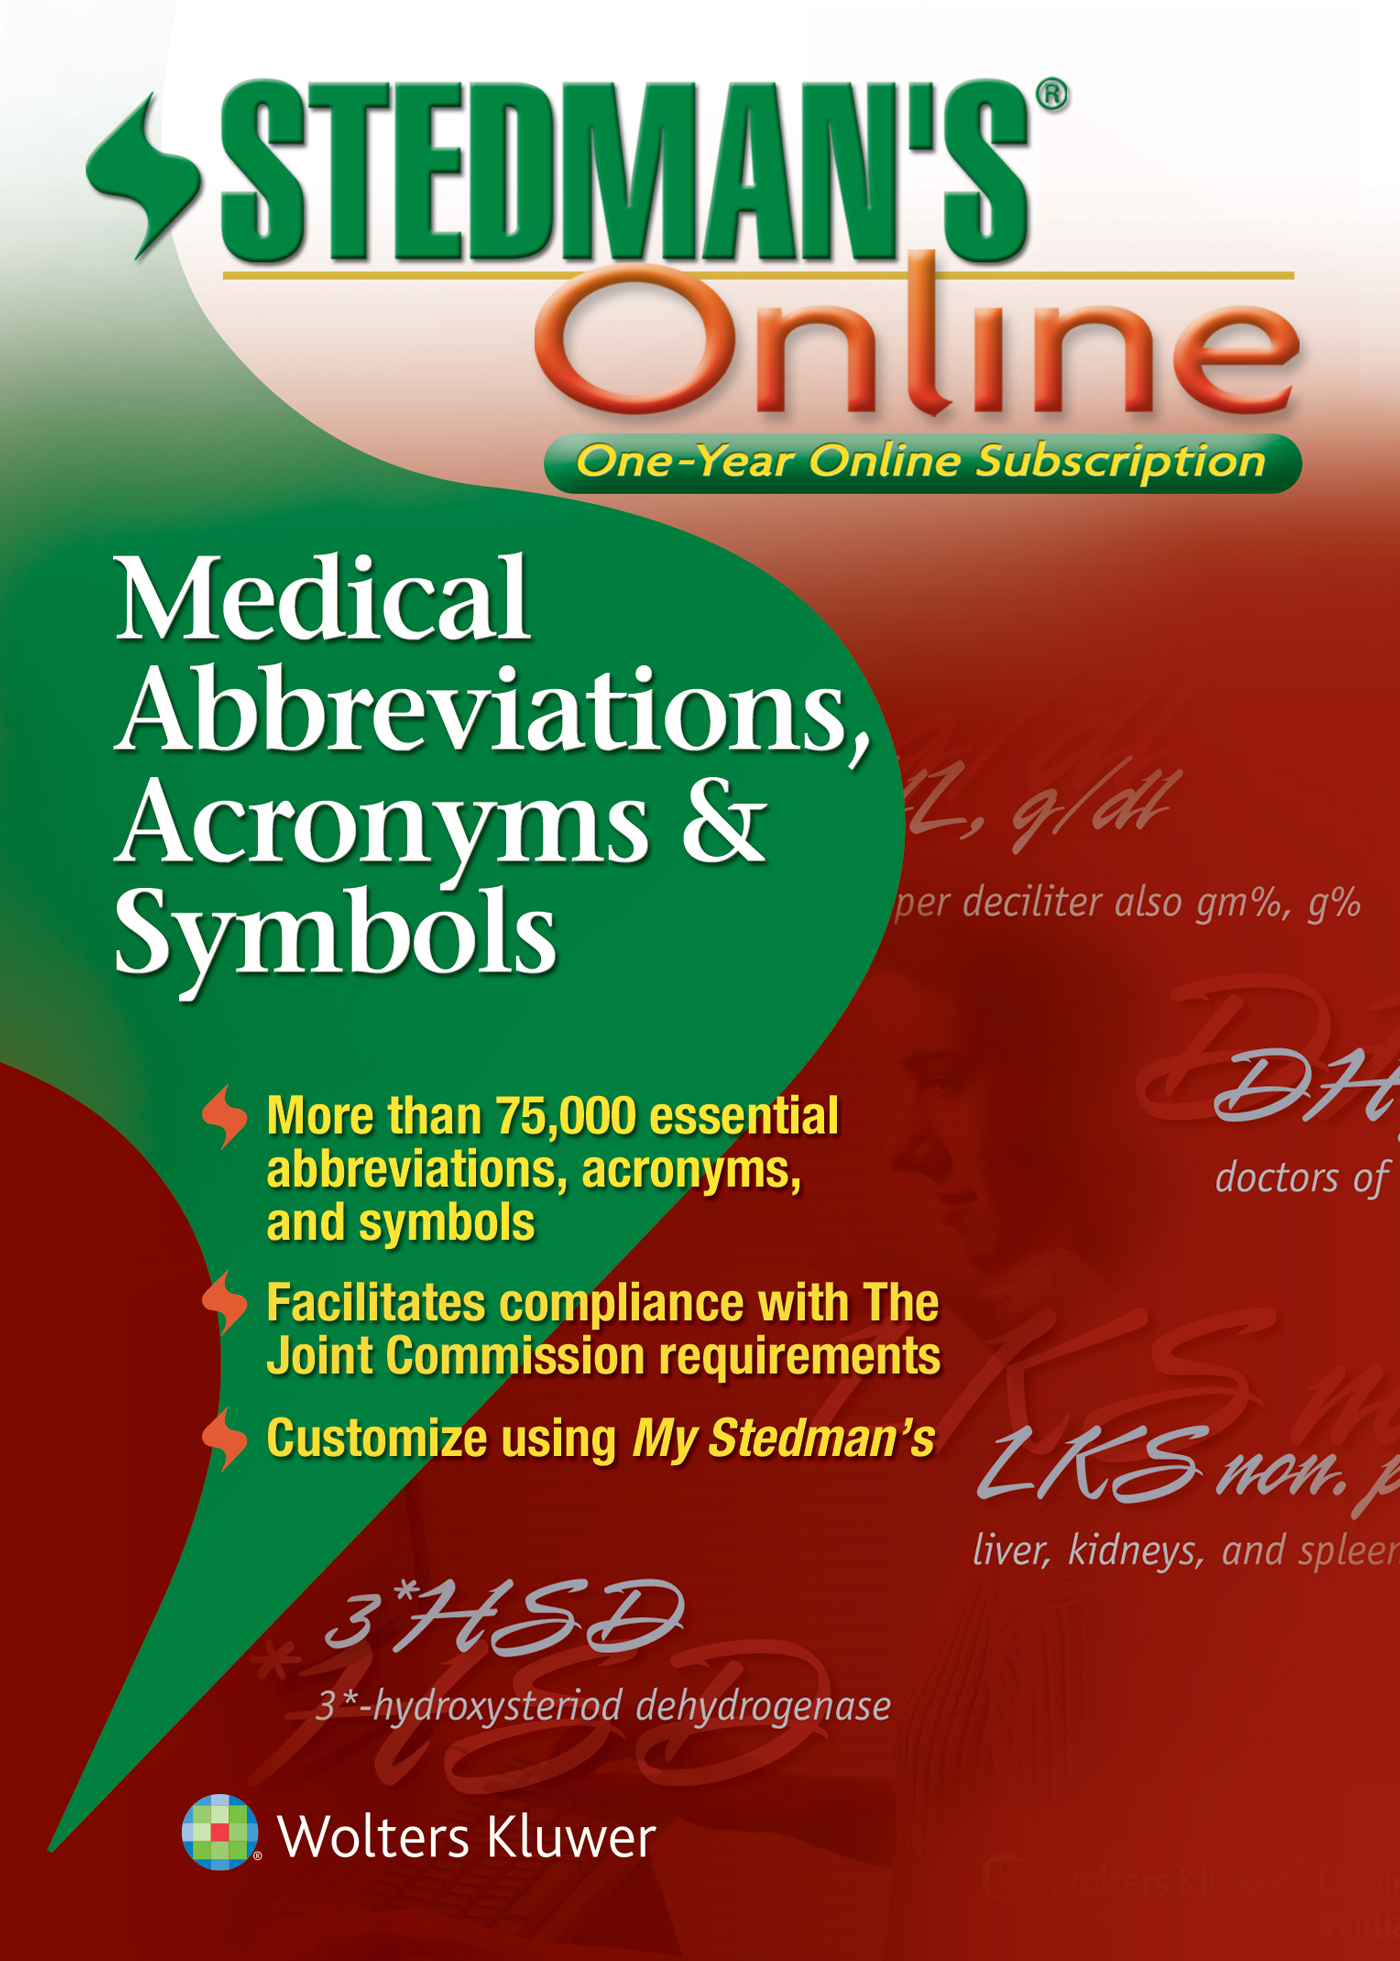 Stedman's Medical Abbreviations, Acronyms & Symbols book cover